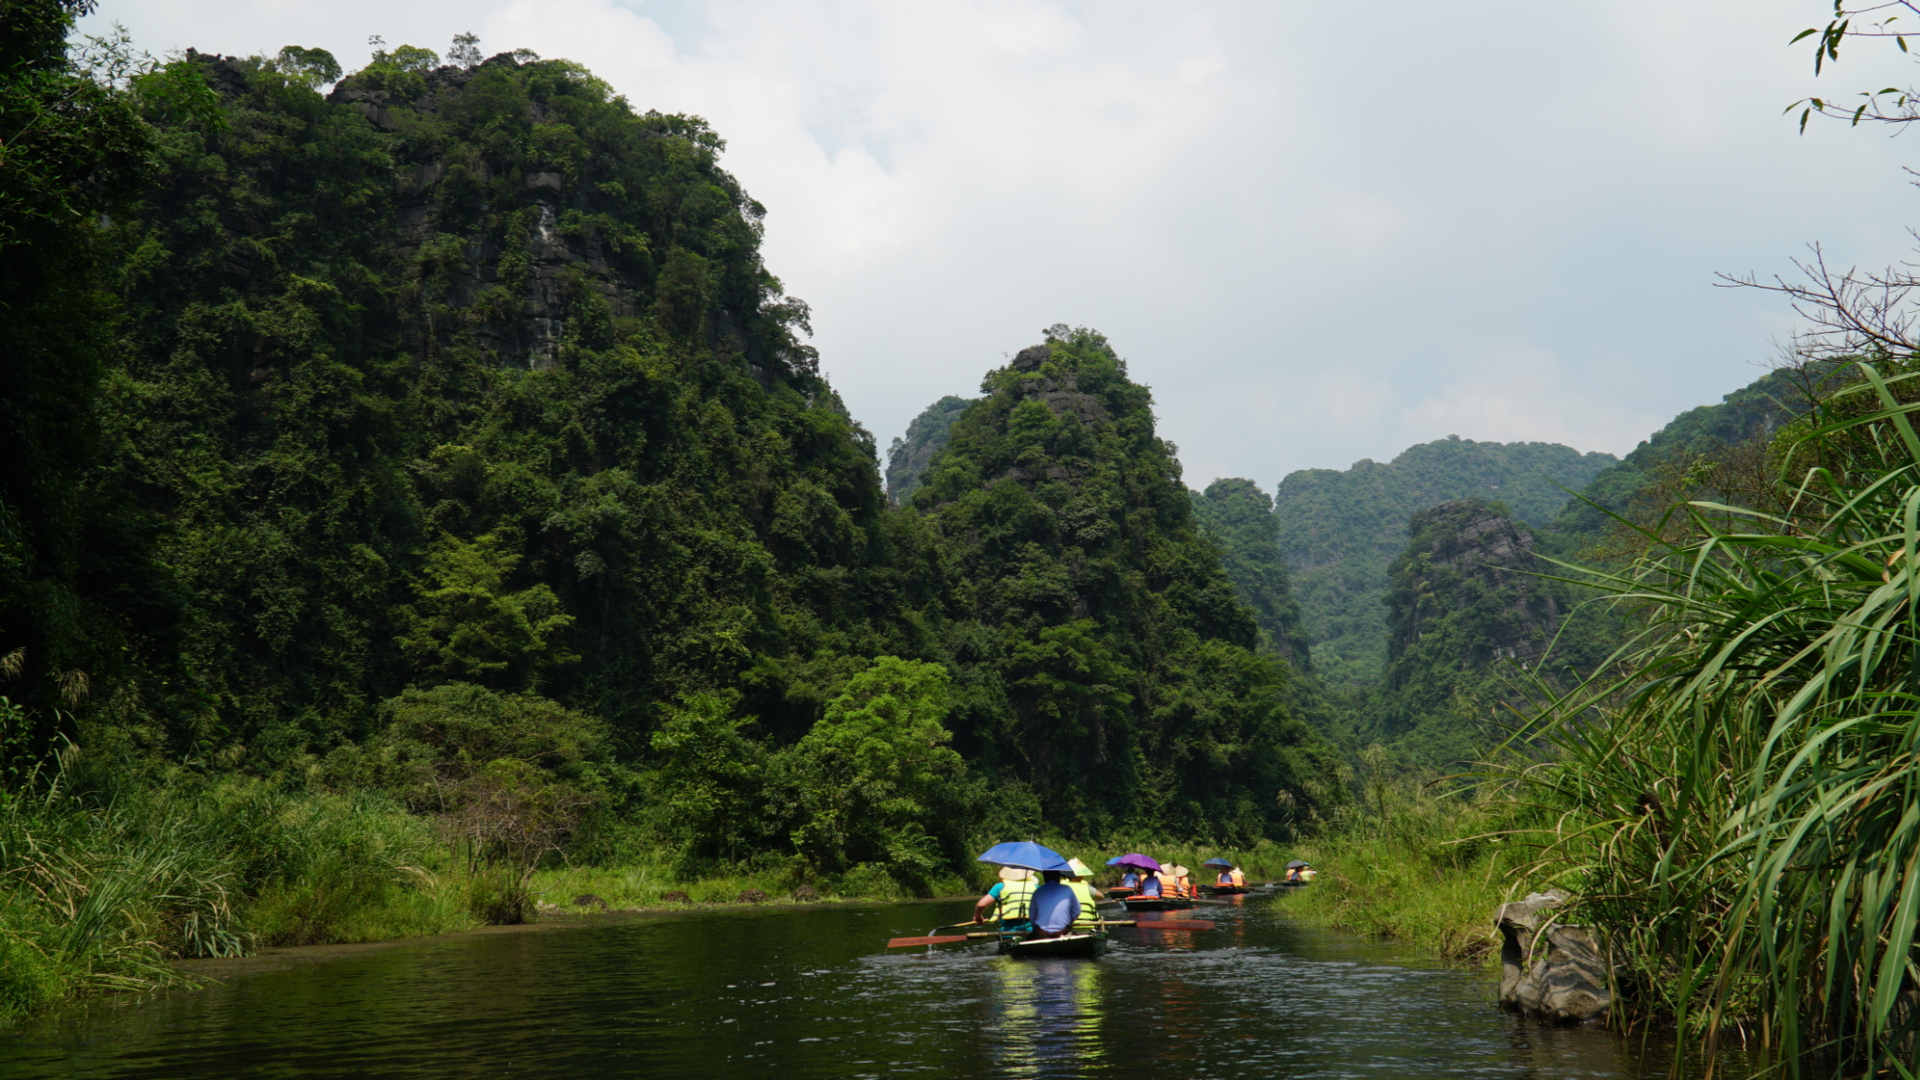 Go-Indochine boat tour Ninh Binh